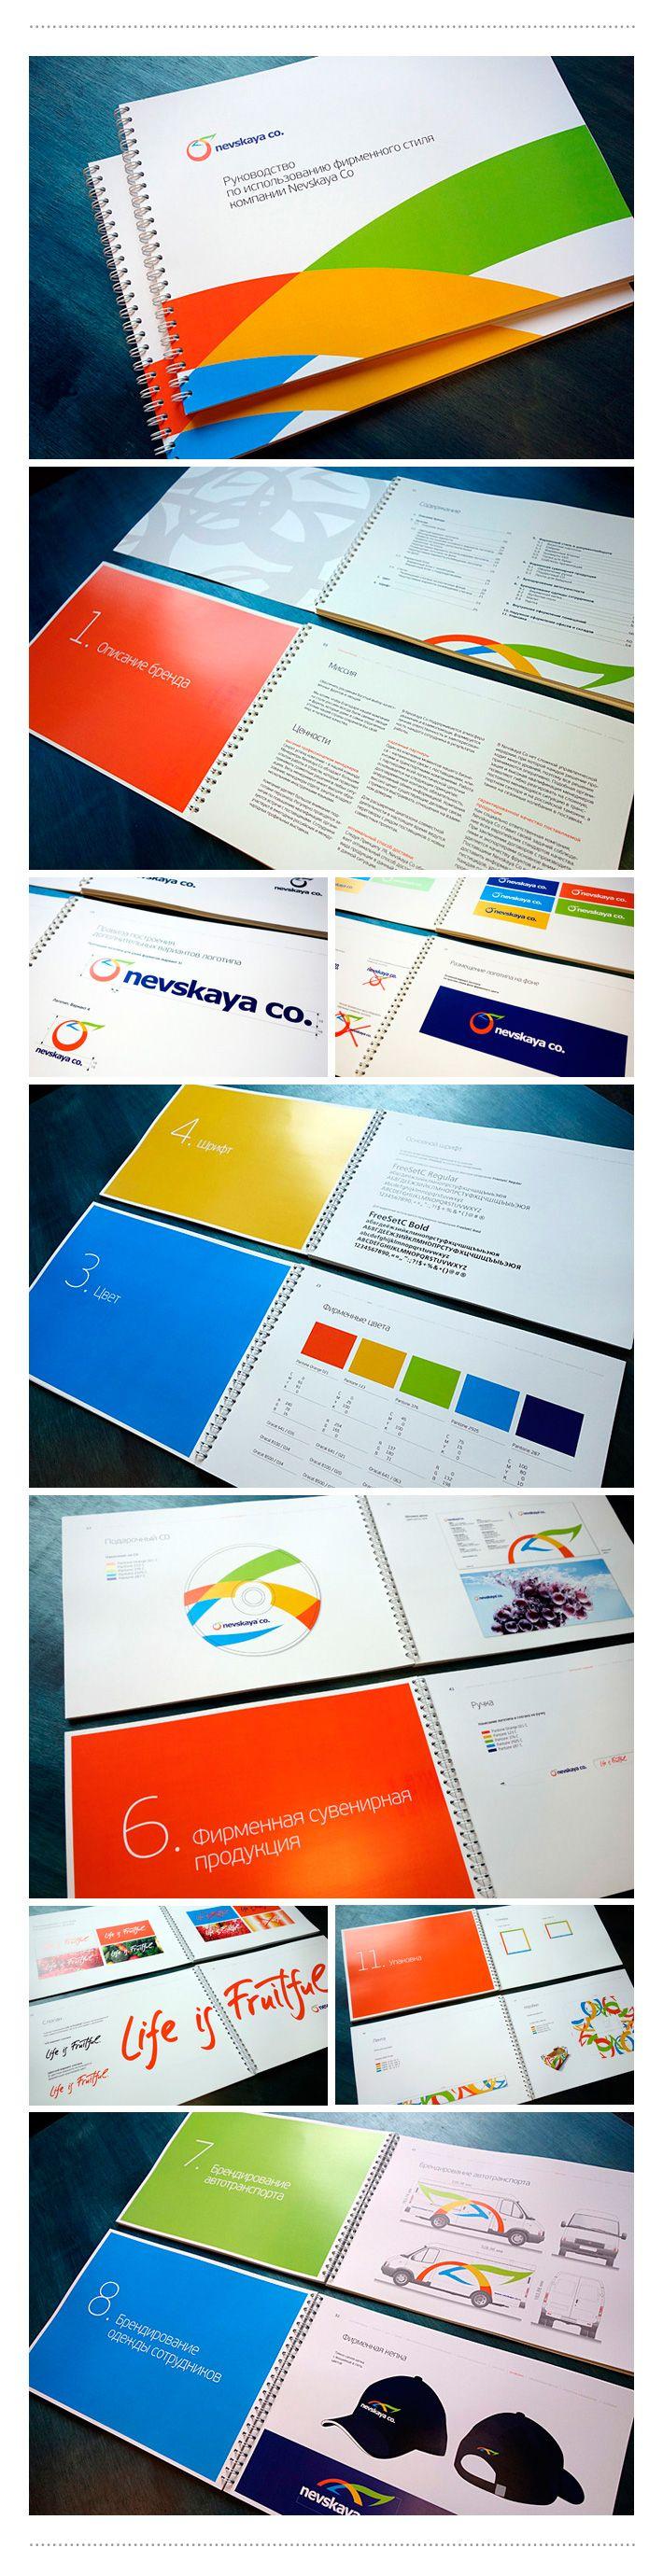 Logo and identity for fruit logistic company Nevskaya Co. Логотип и корпоративный стиль Nevskaya Co. - компании поставщика фруктов